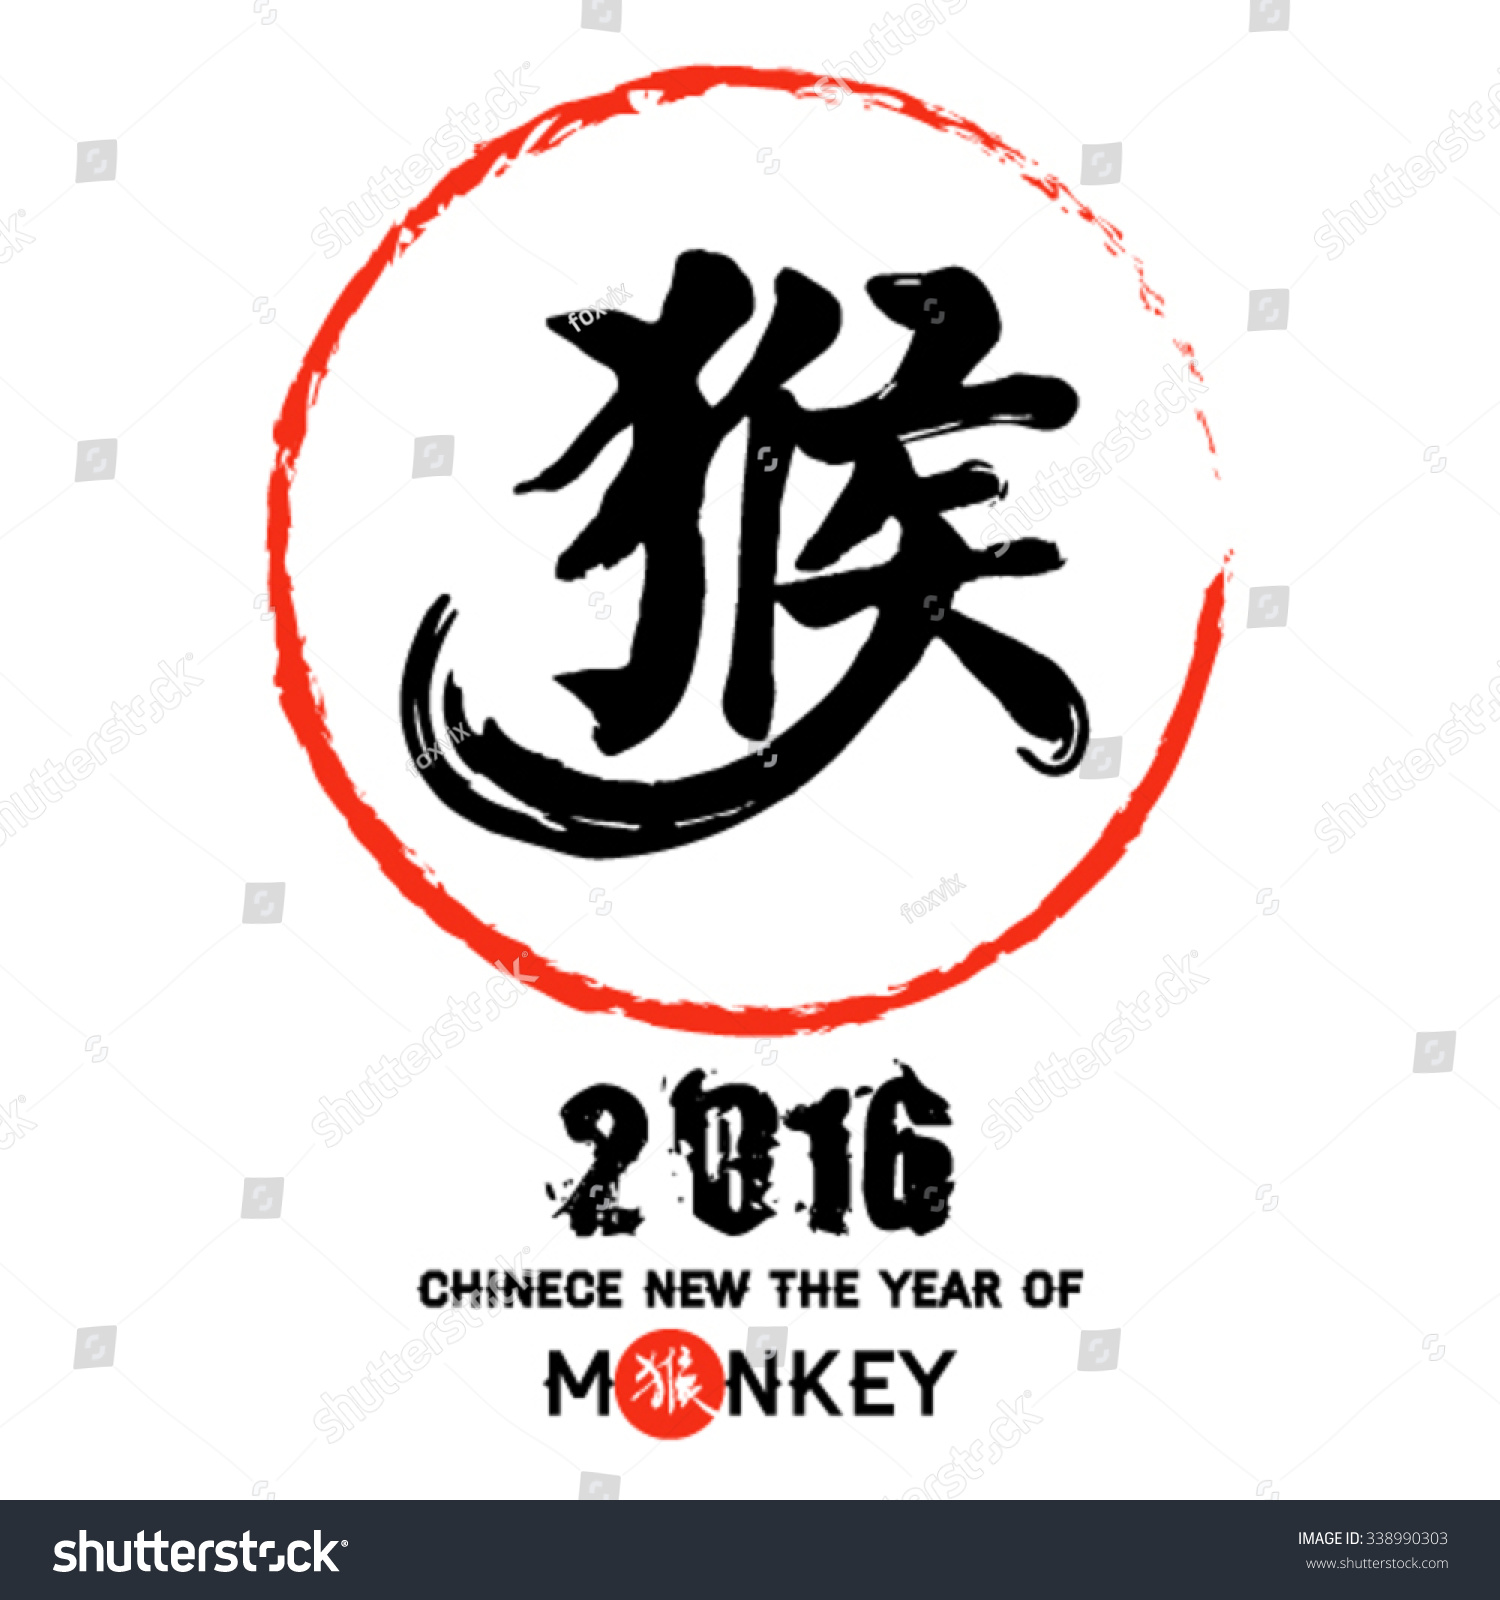 Chinese zodiac monkey with calligraphy design translation